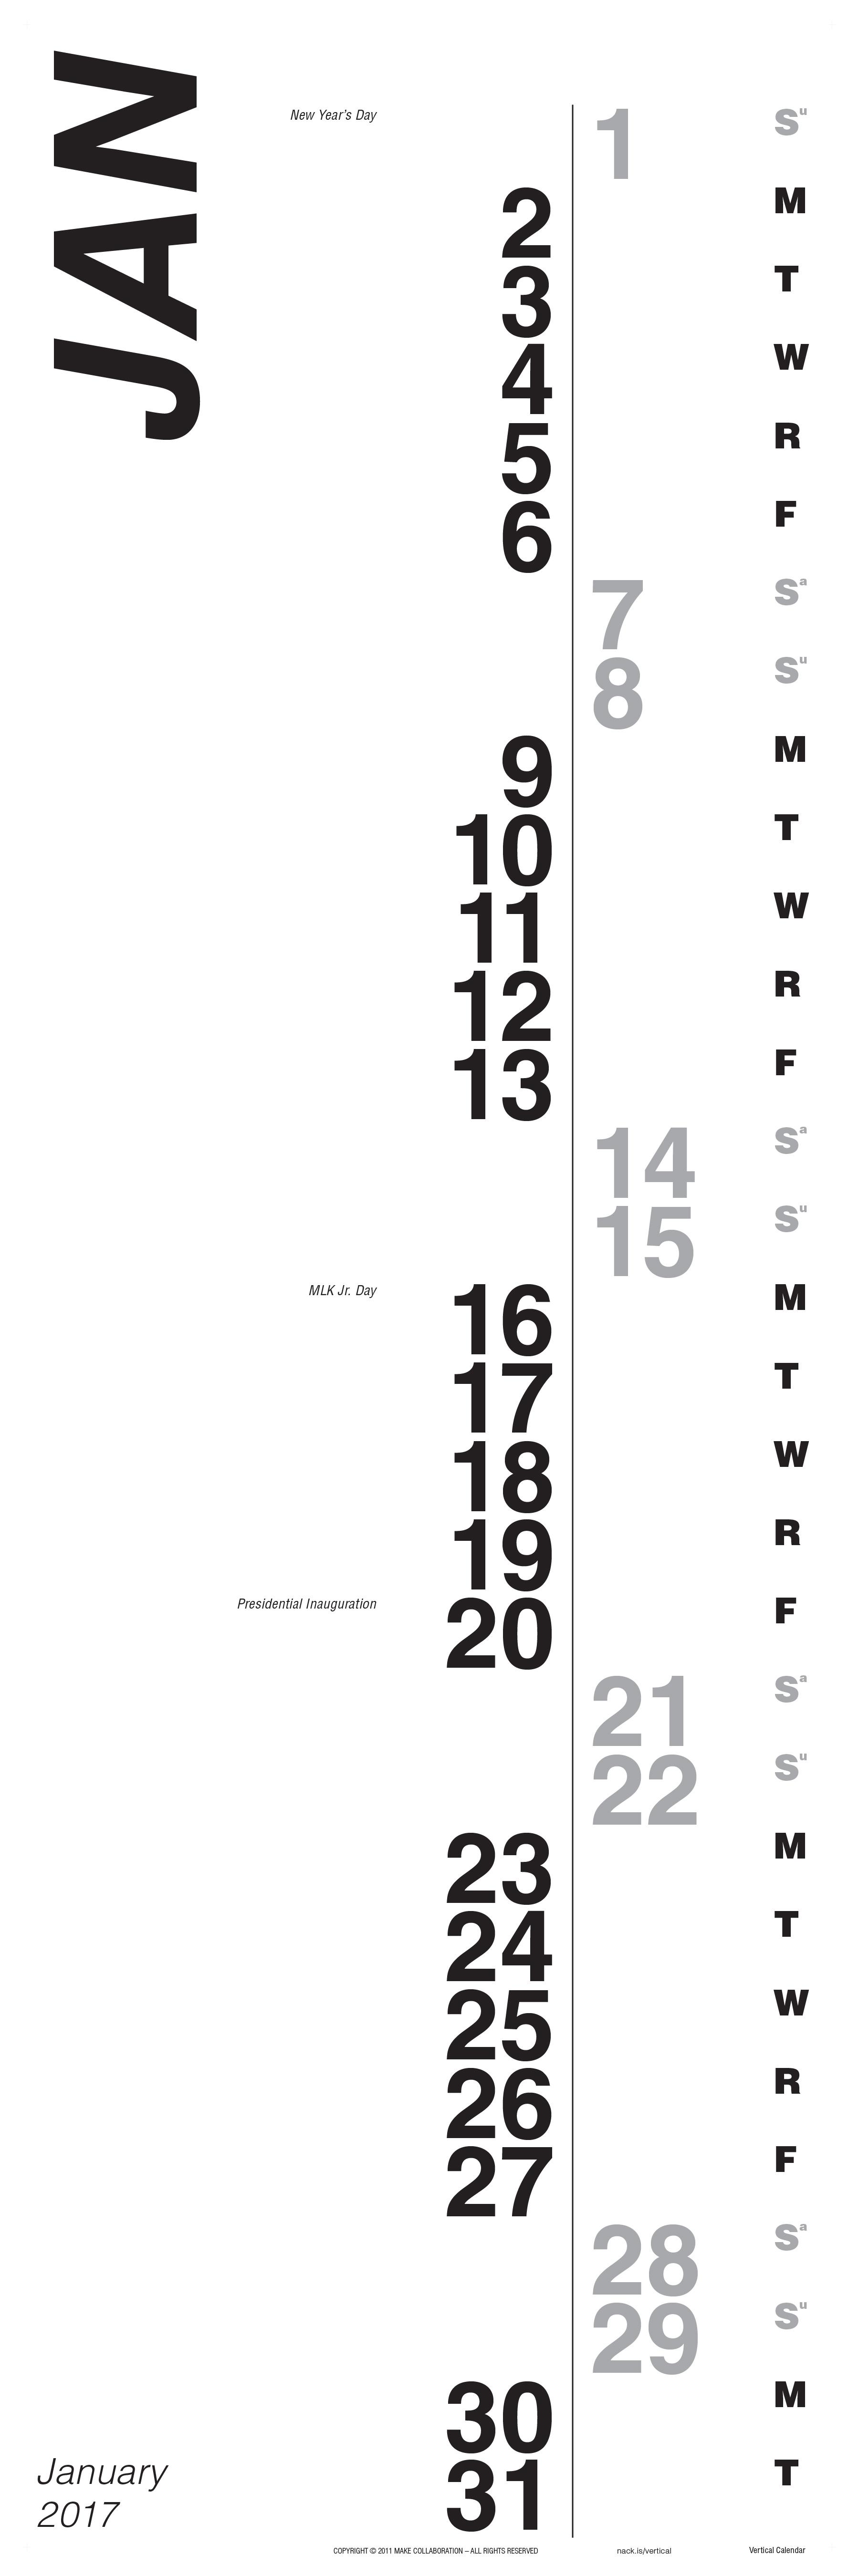 Vertical - 12